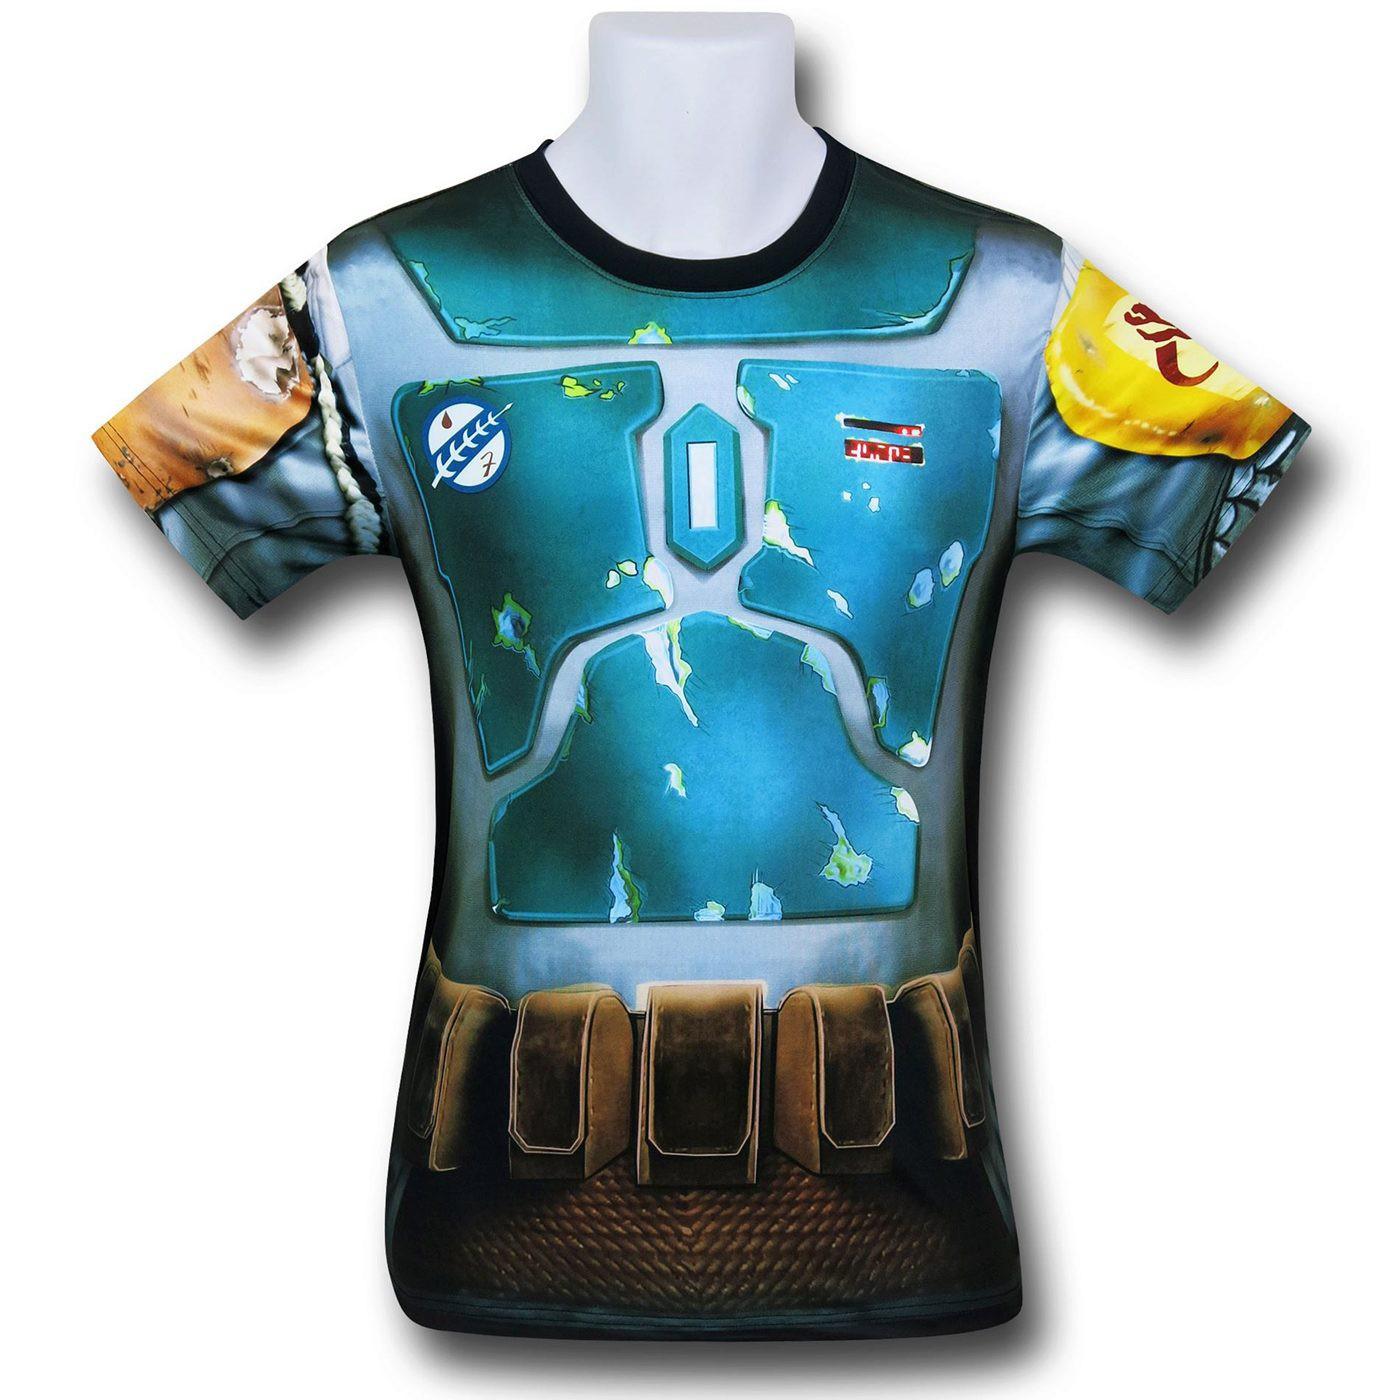 Boba Fett Sublimated Costume Fitness T-Shirt